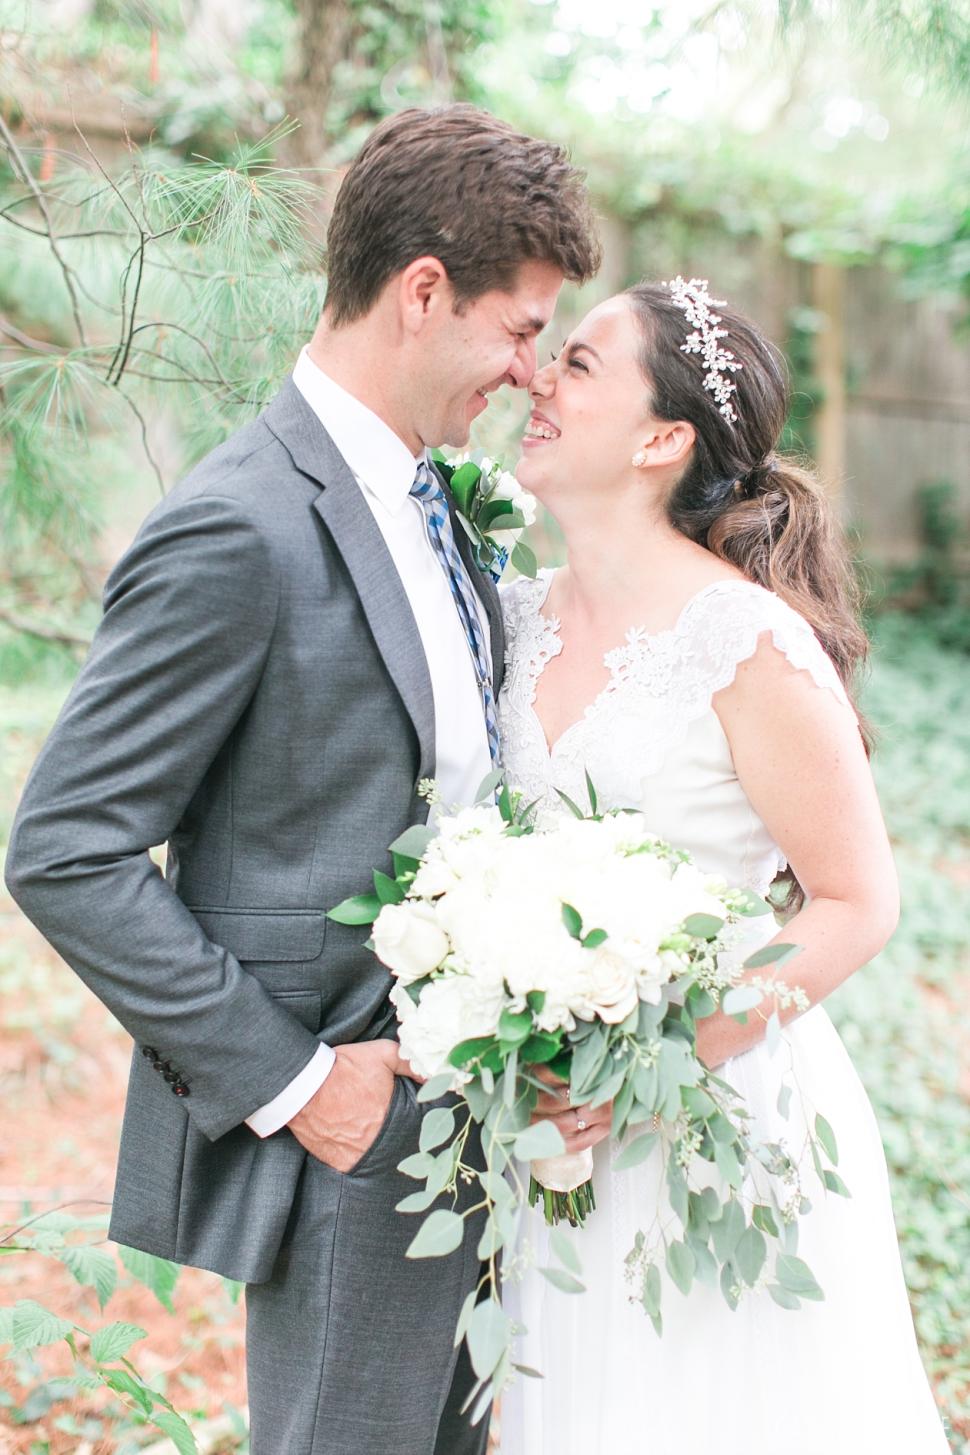 Bright-Happy-NJ-Wedding-Photographer-CassiClaire_45.jpg